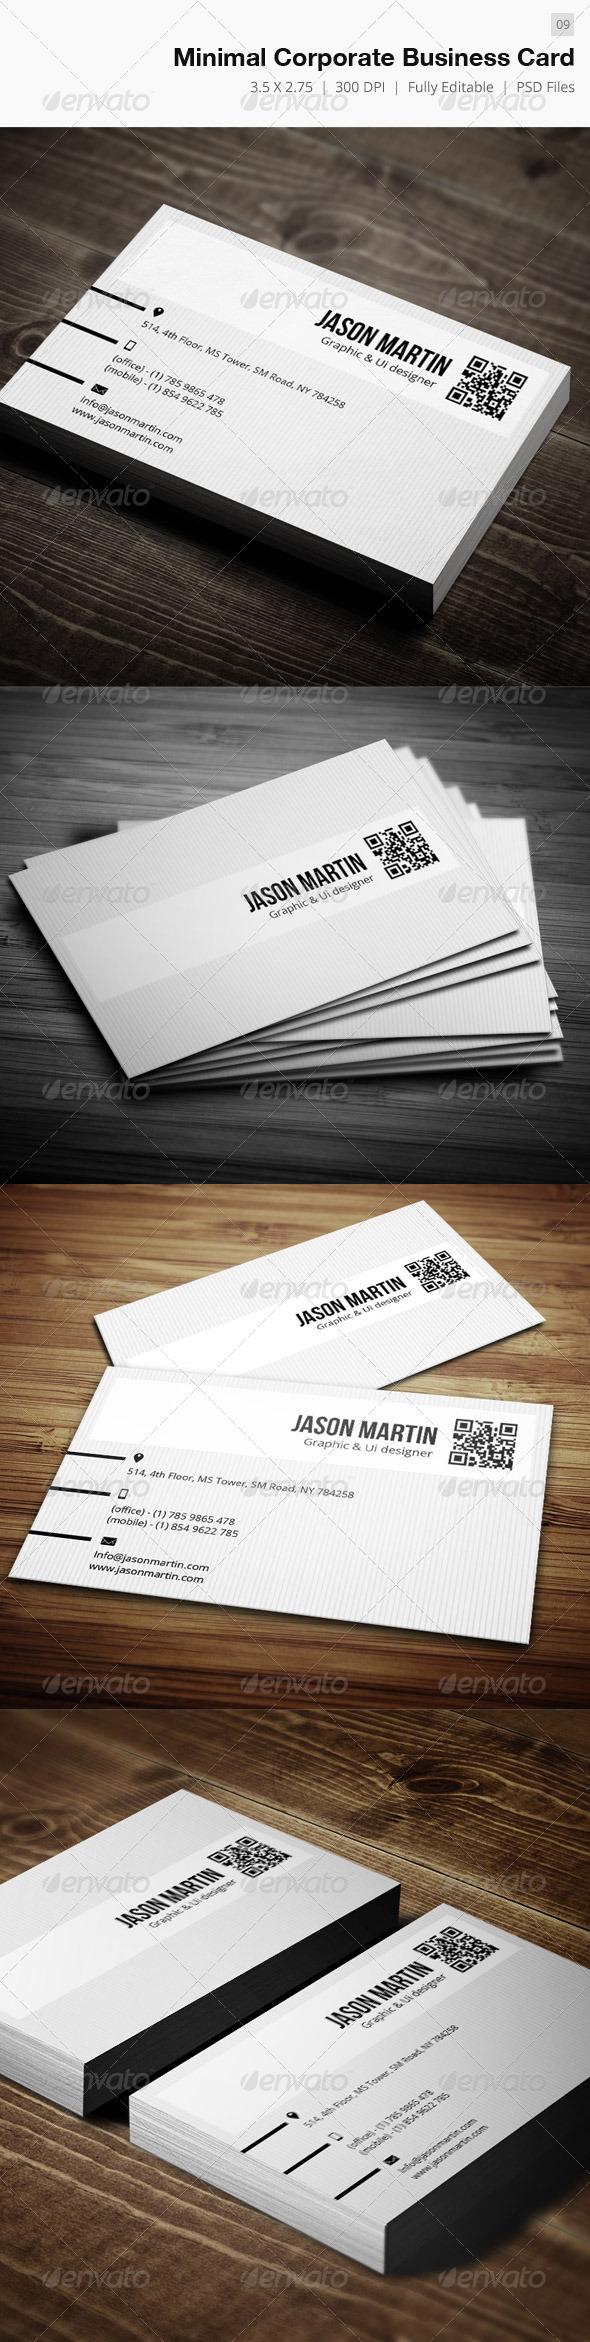 Corporate Minimal Business Card - 09 - Corporate Business Cards